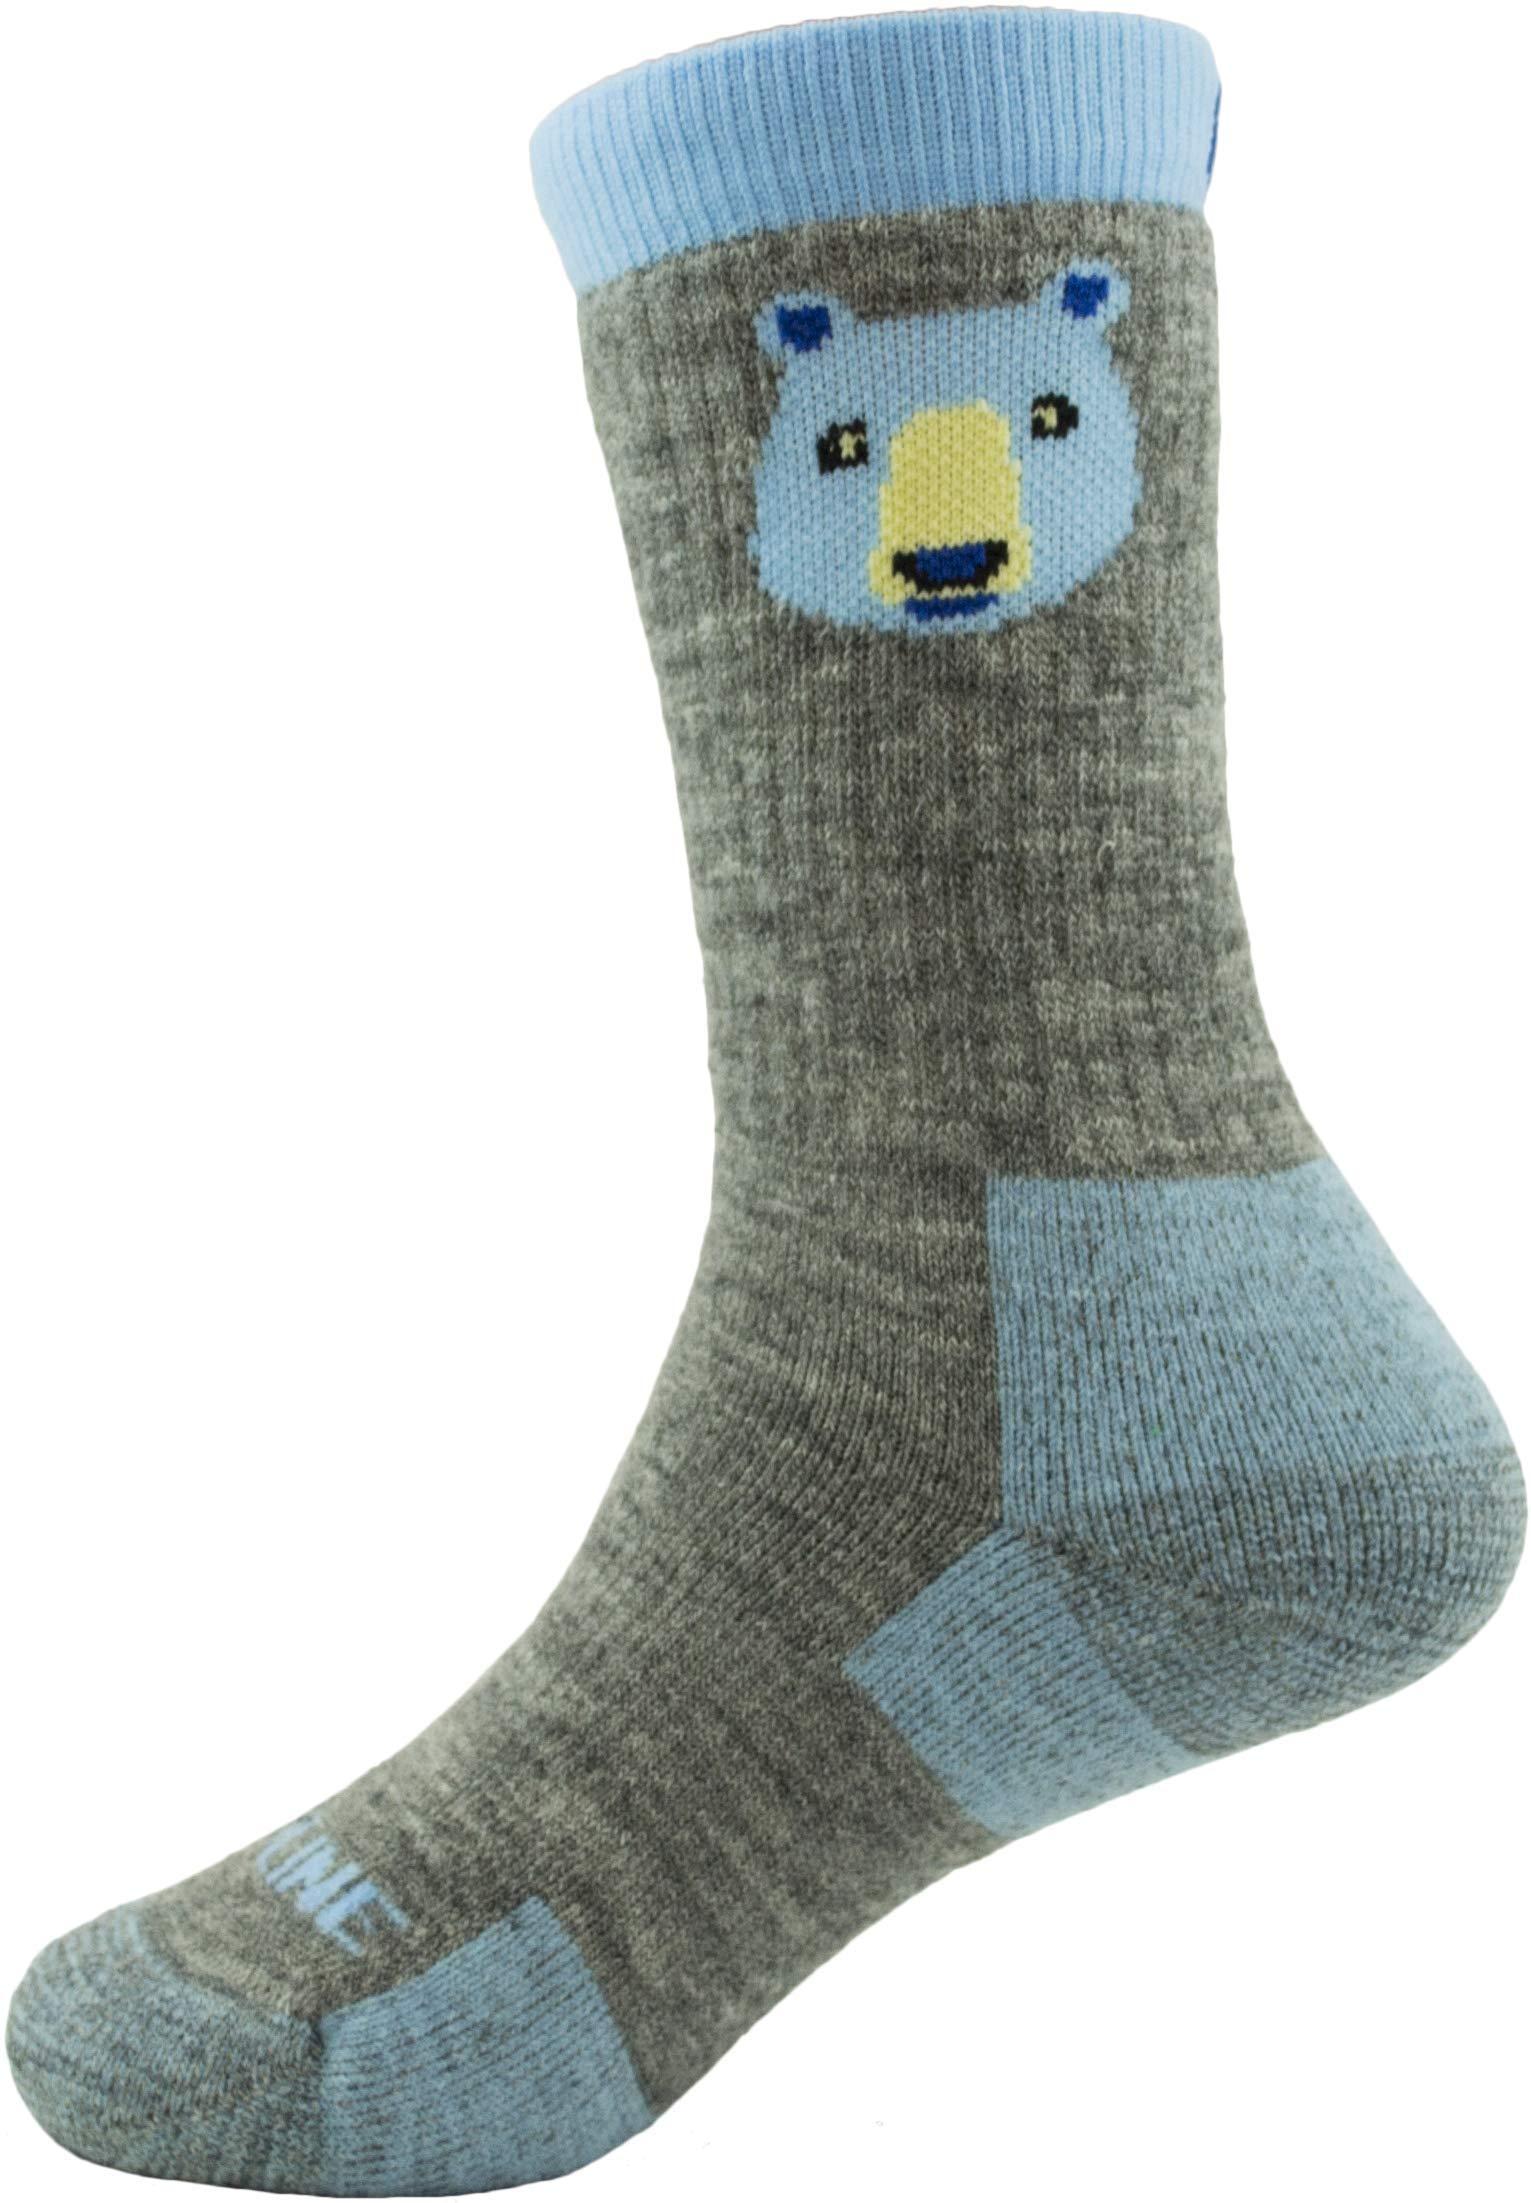 CloudLine Merino Wool Kid's Spirit Animal Socks - 2 Pack - Blue Bear - Size Y-XS - Made in USA